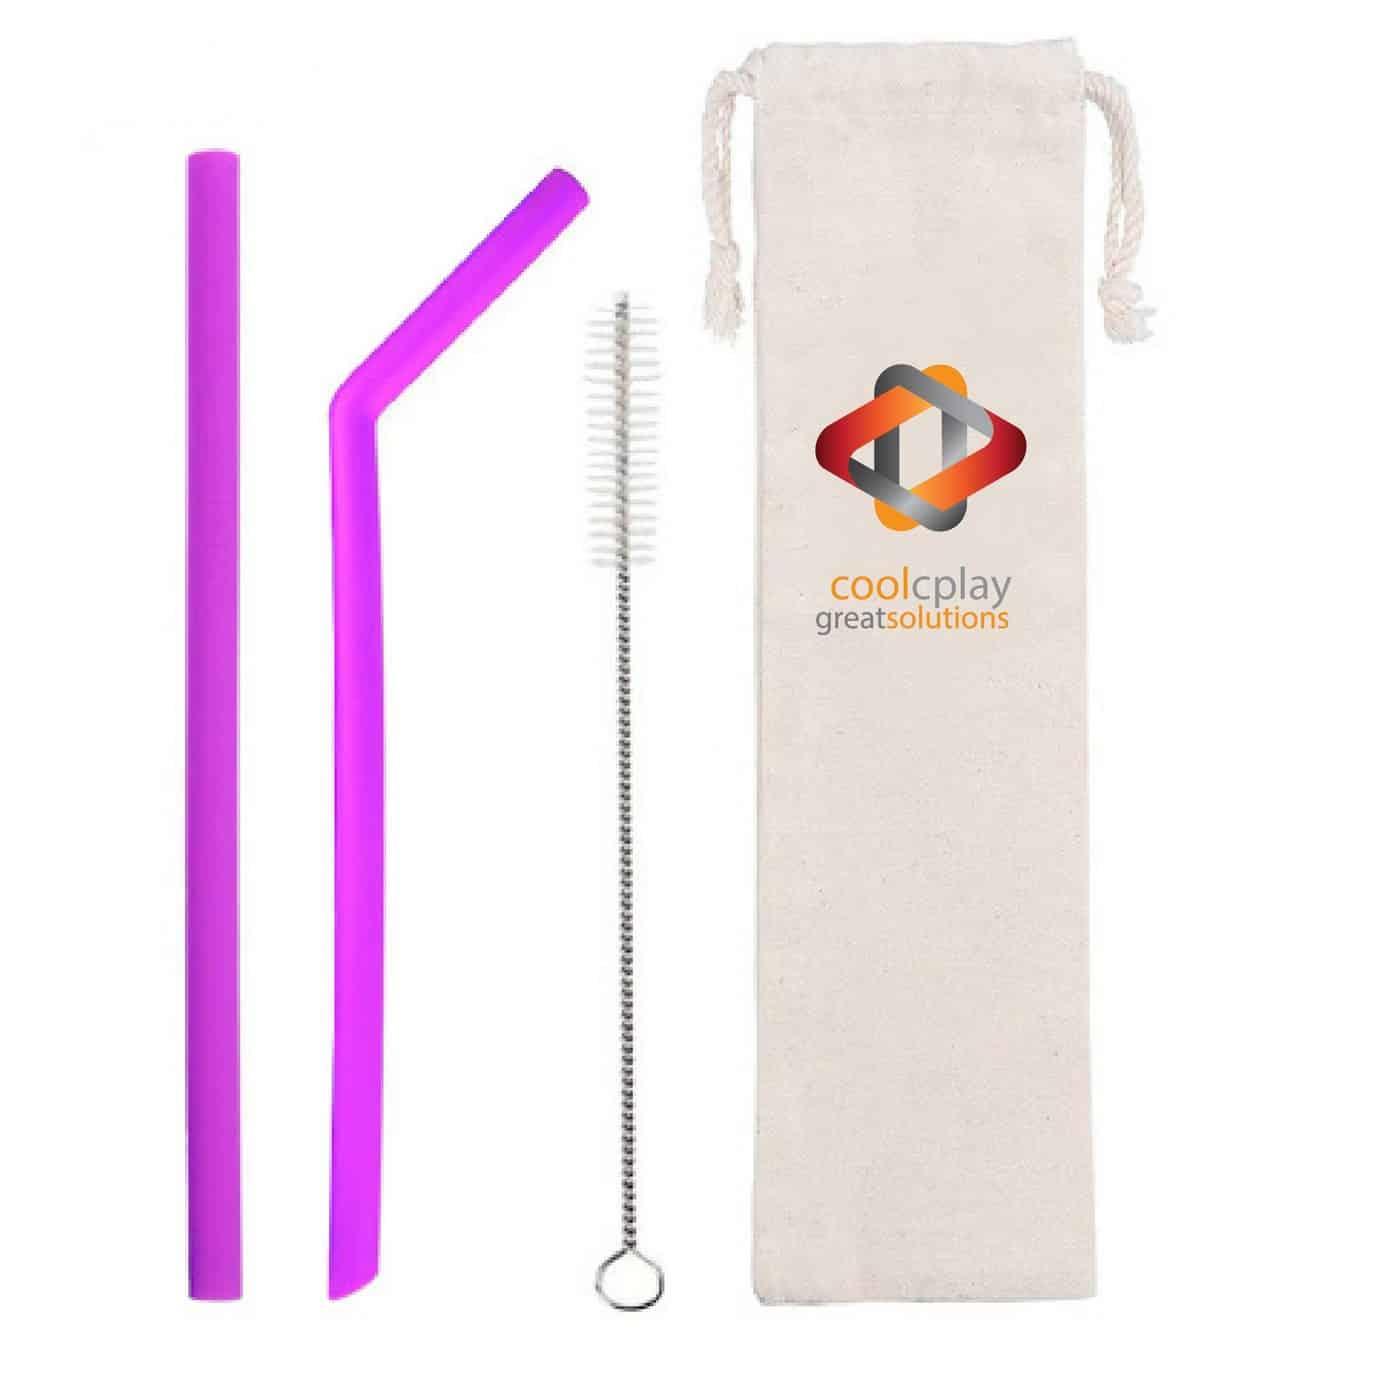 Flexible Silicone Straws